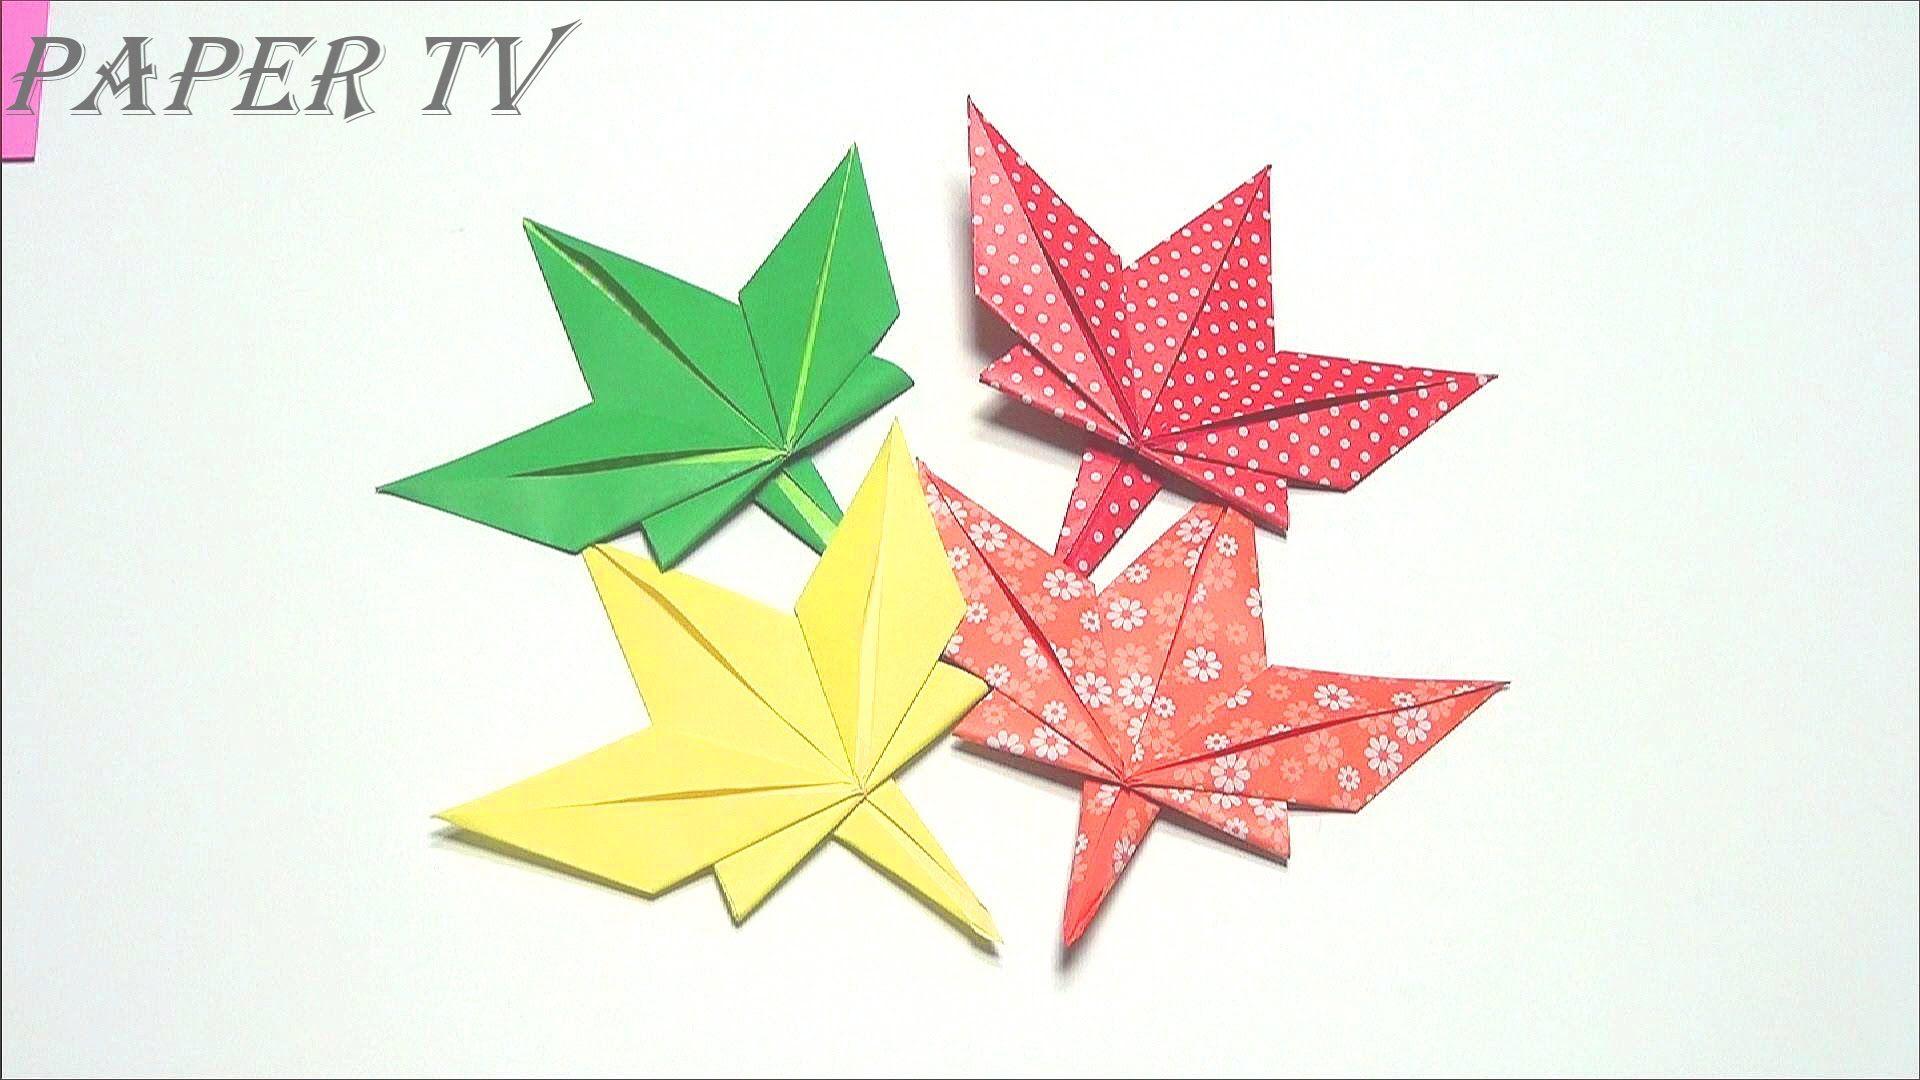 [Paper TV] Origami Maple Leaf 단풍잎 종이접기 折り紙 カエデの葉 como ... - photo#14